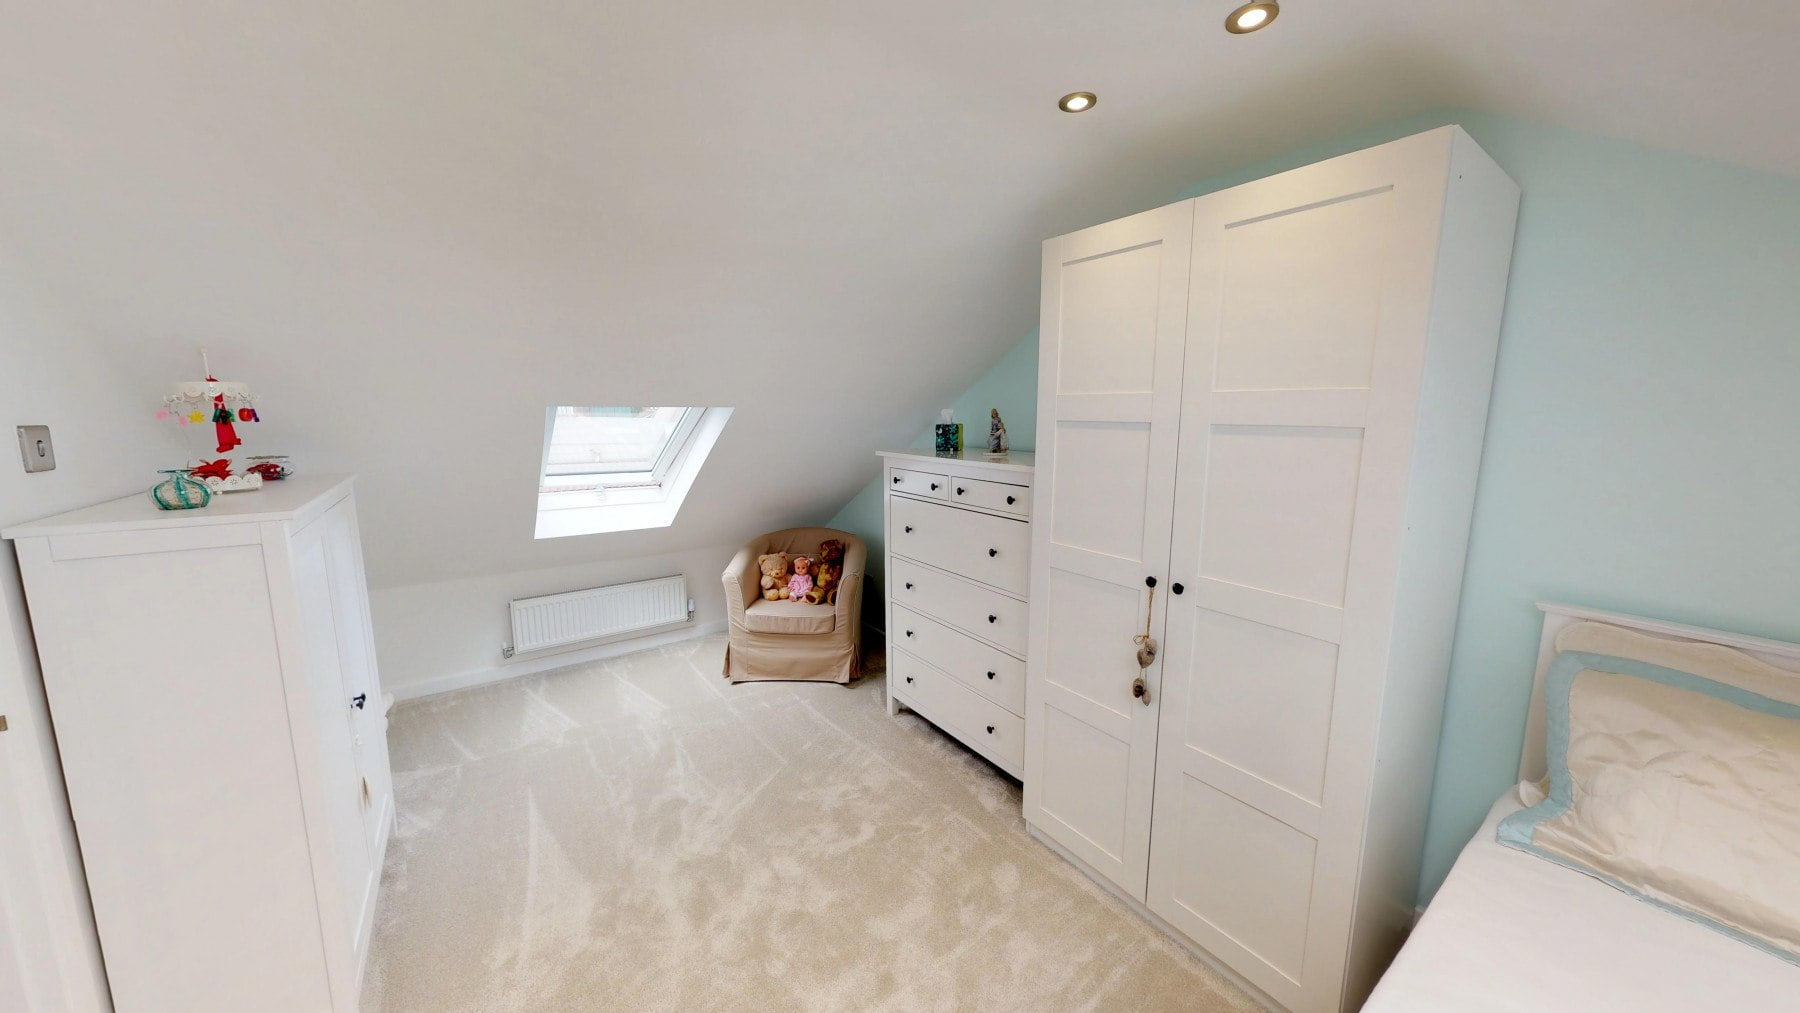 Loft-Pro-Multi-Room-Bungalow-Velux-10022018_170242